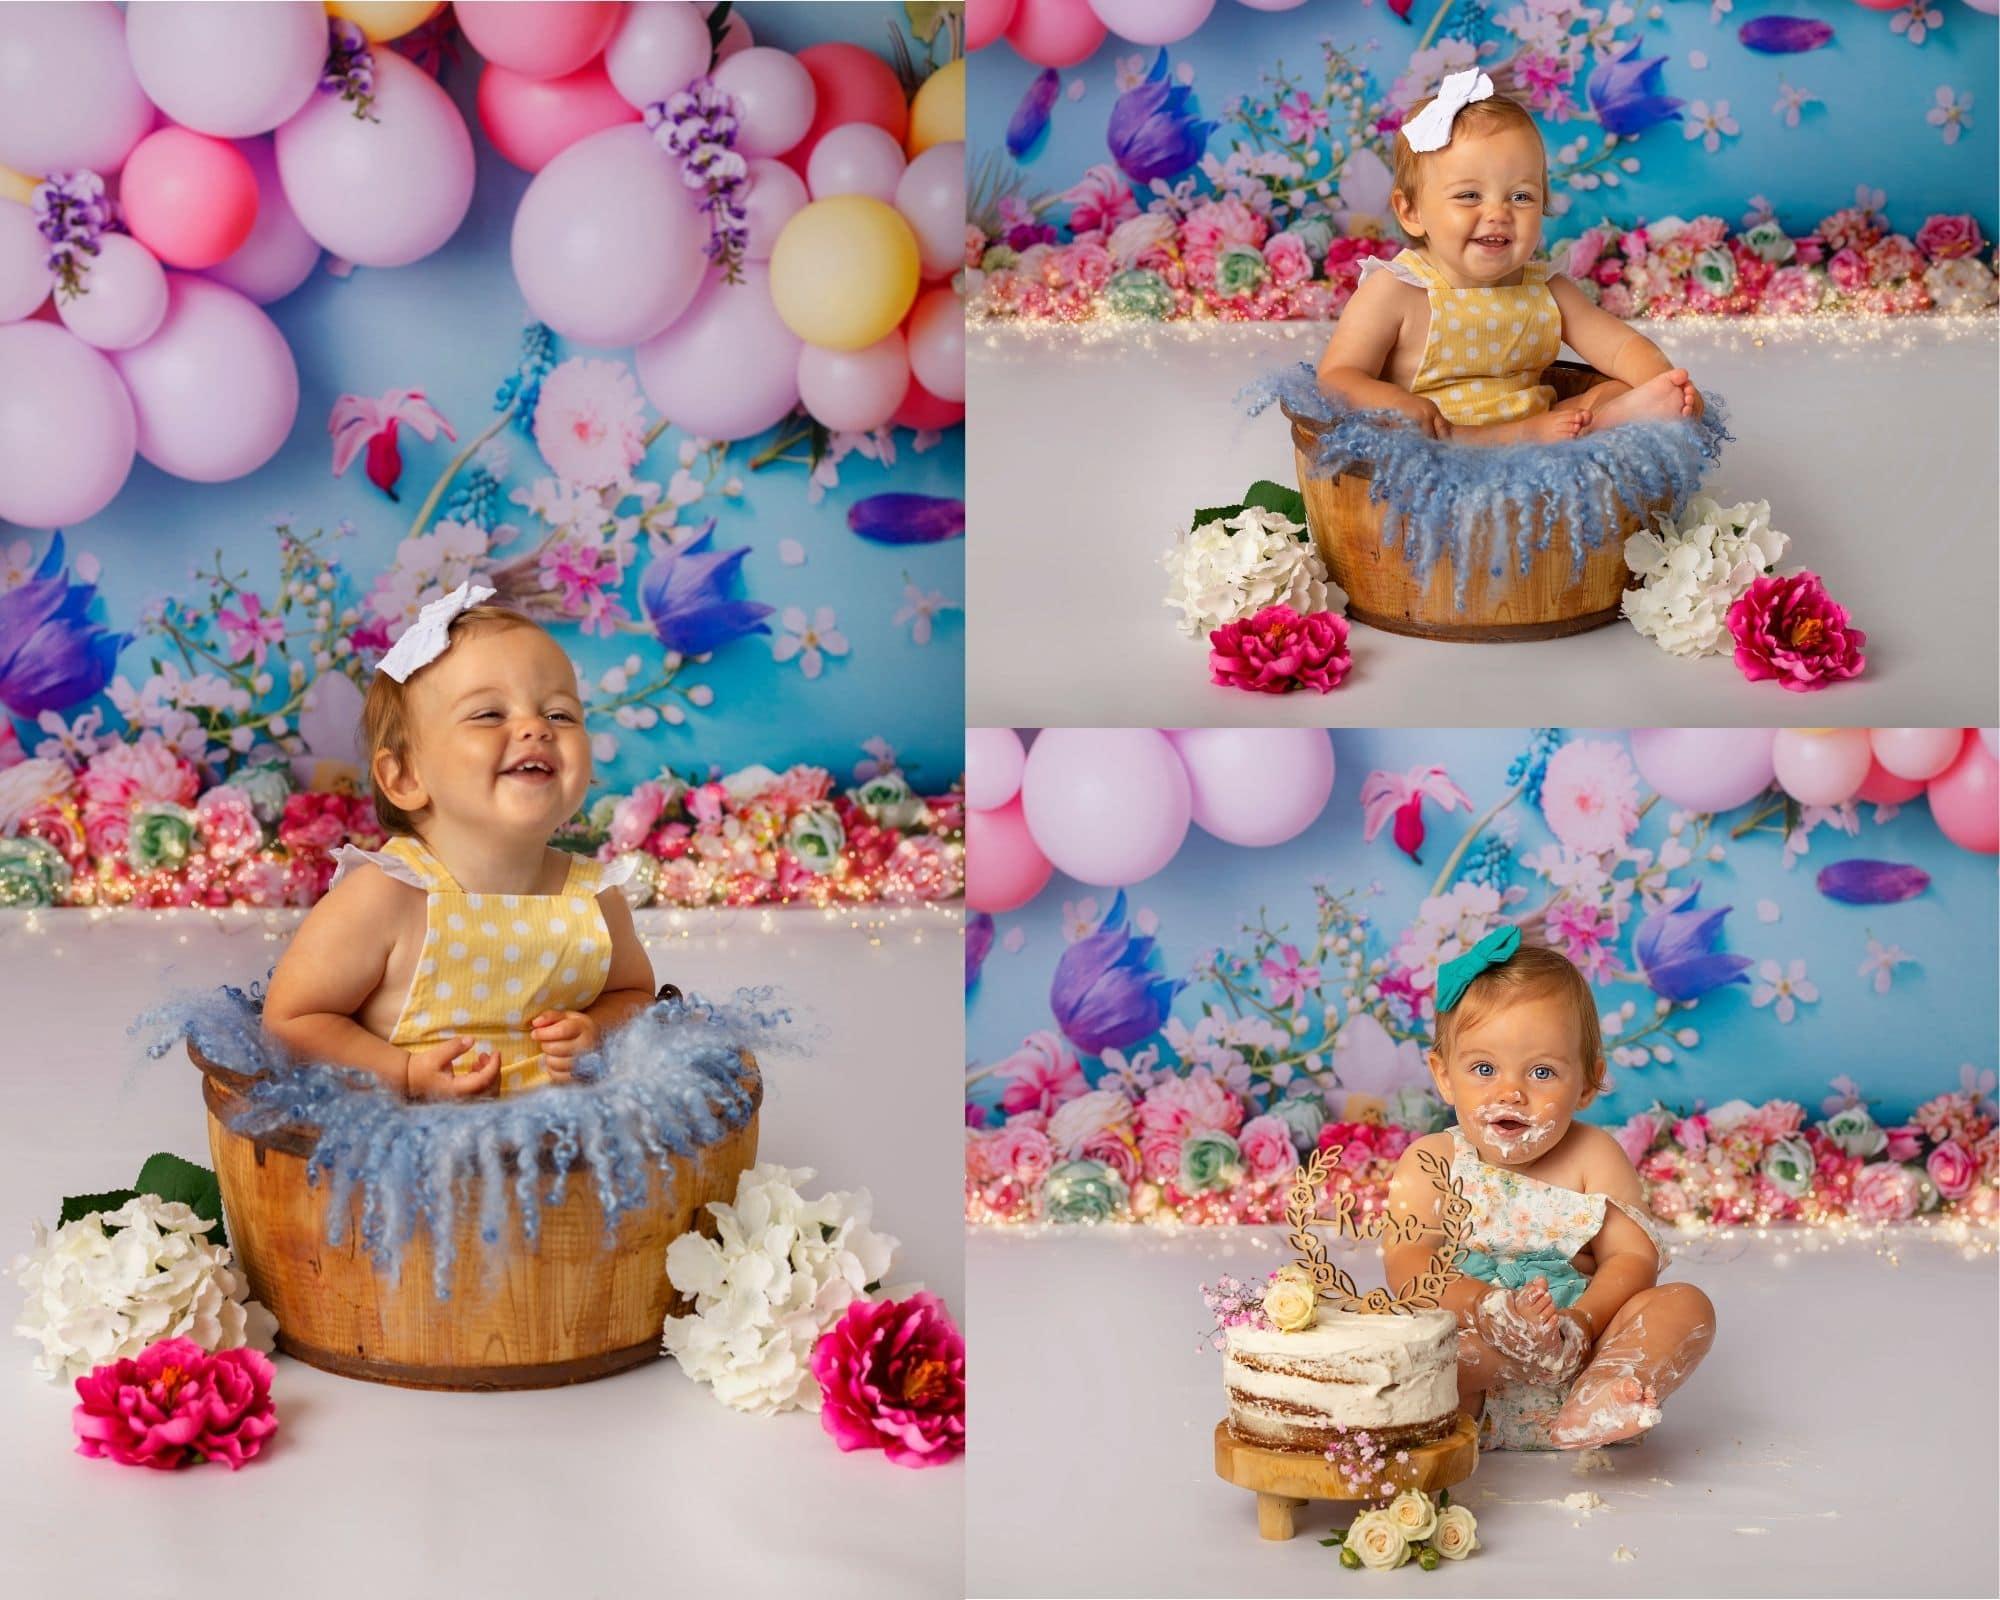 photographe-bebe-seance-smas-the-cake-strasbourg-clover-photographies-3